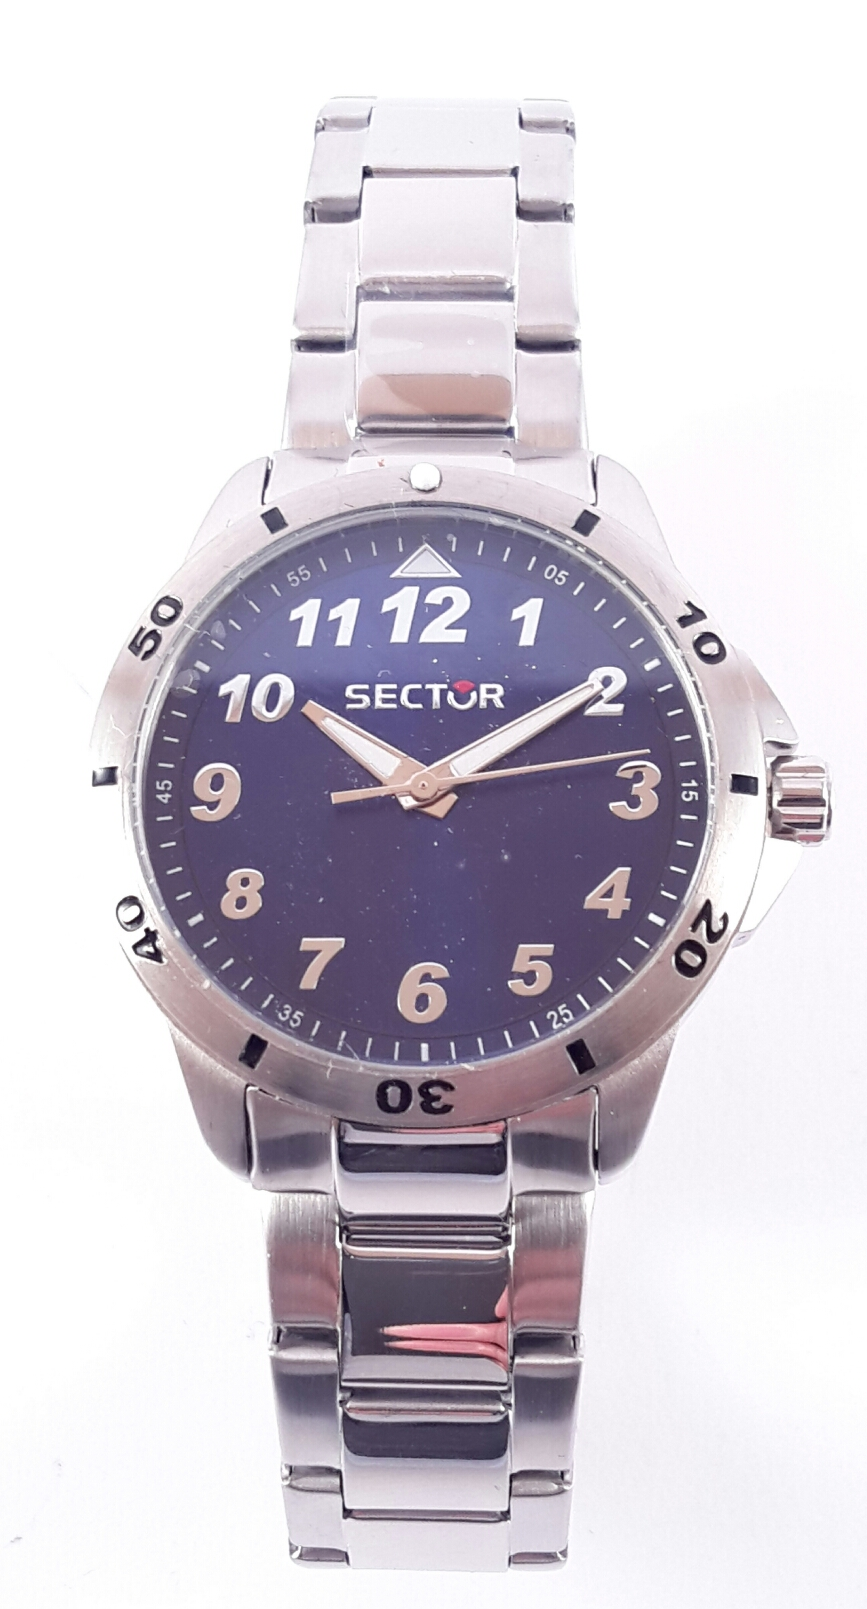 OROLOGIO SECTOR  ref R3253596003